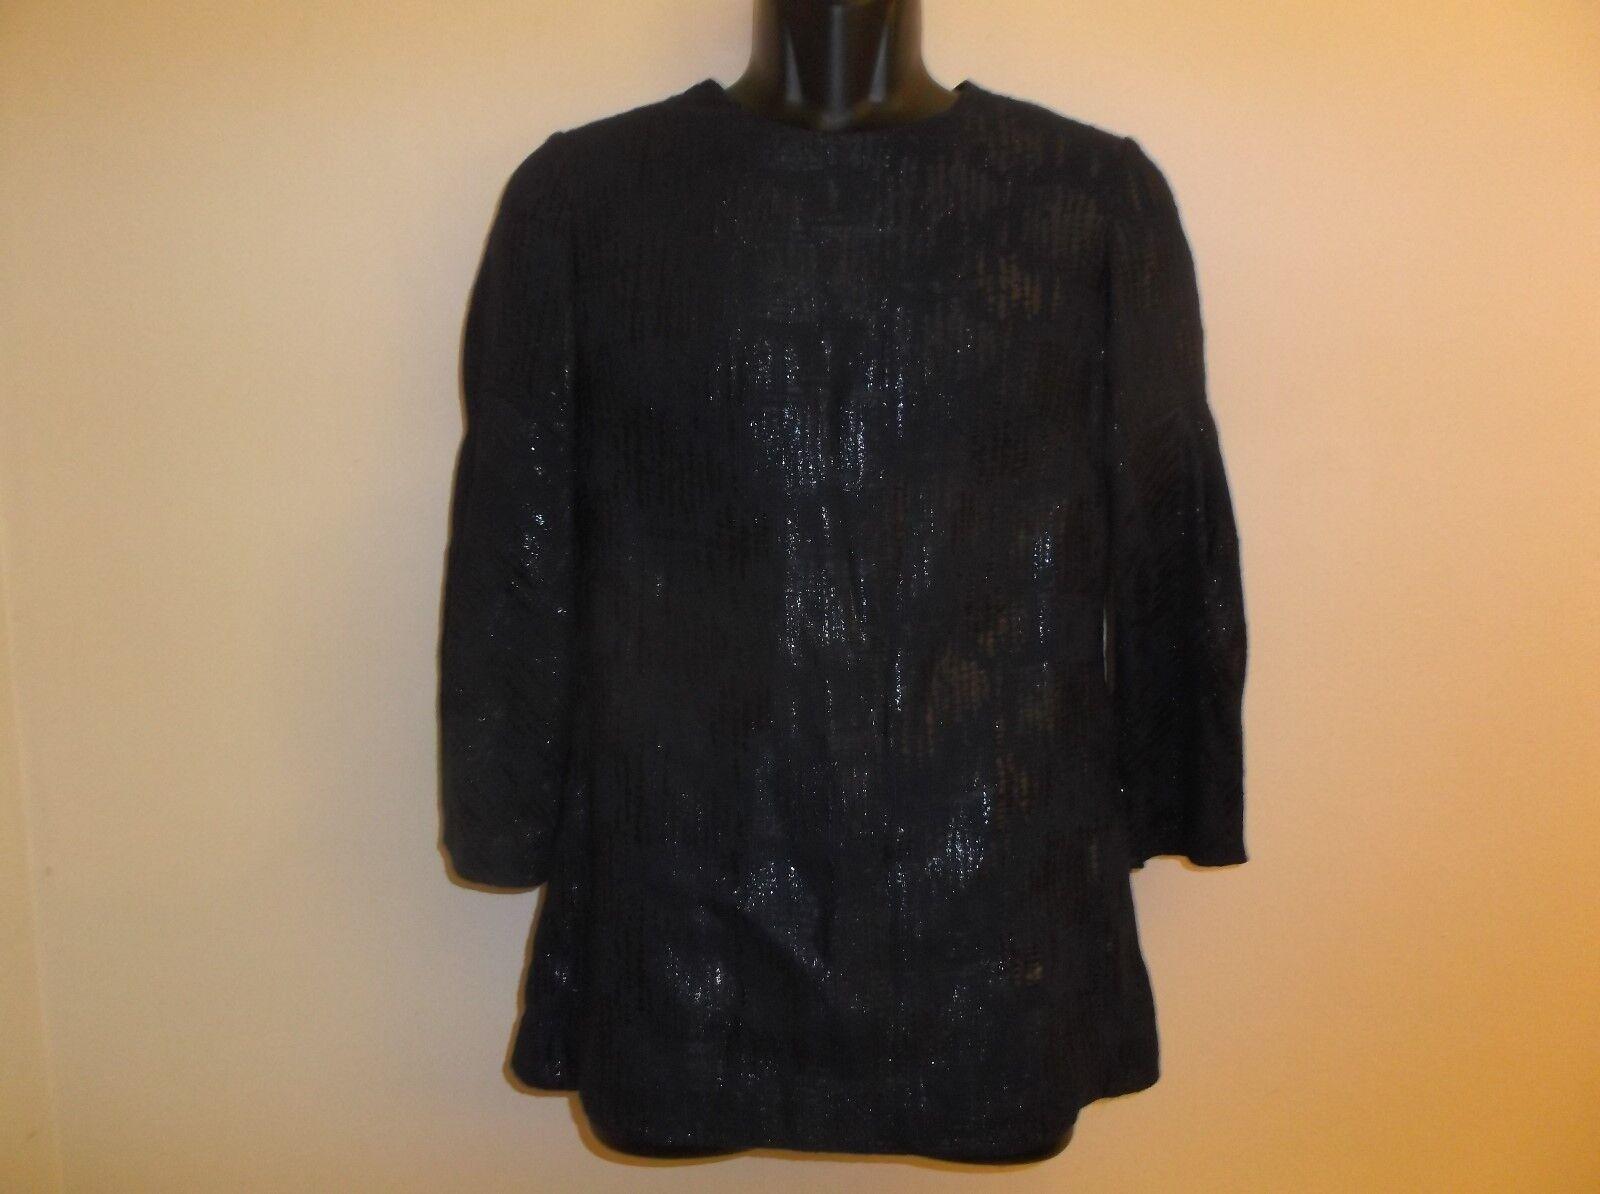 New  Lela Rosa Navy Silk Blend Full Sleeve Blouse Top Größe 8 US